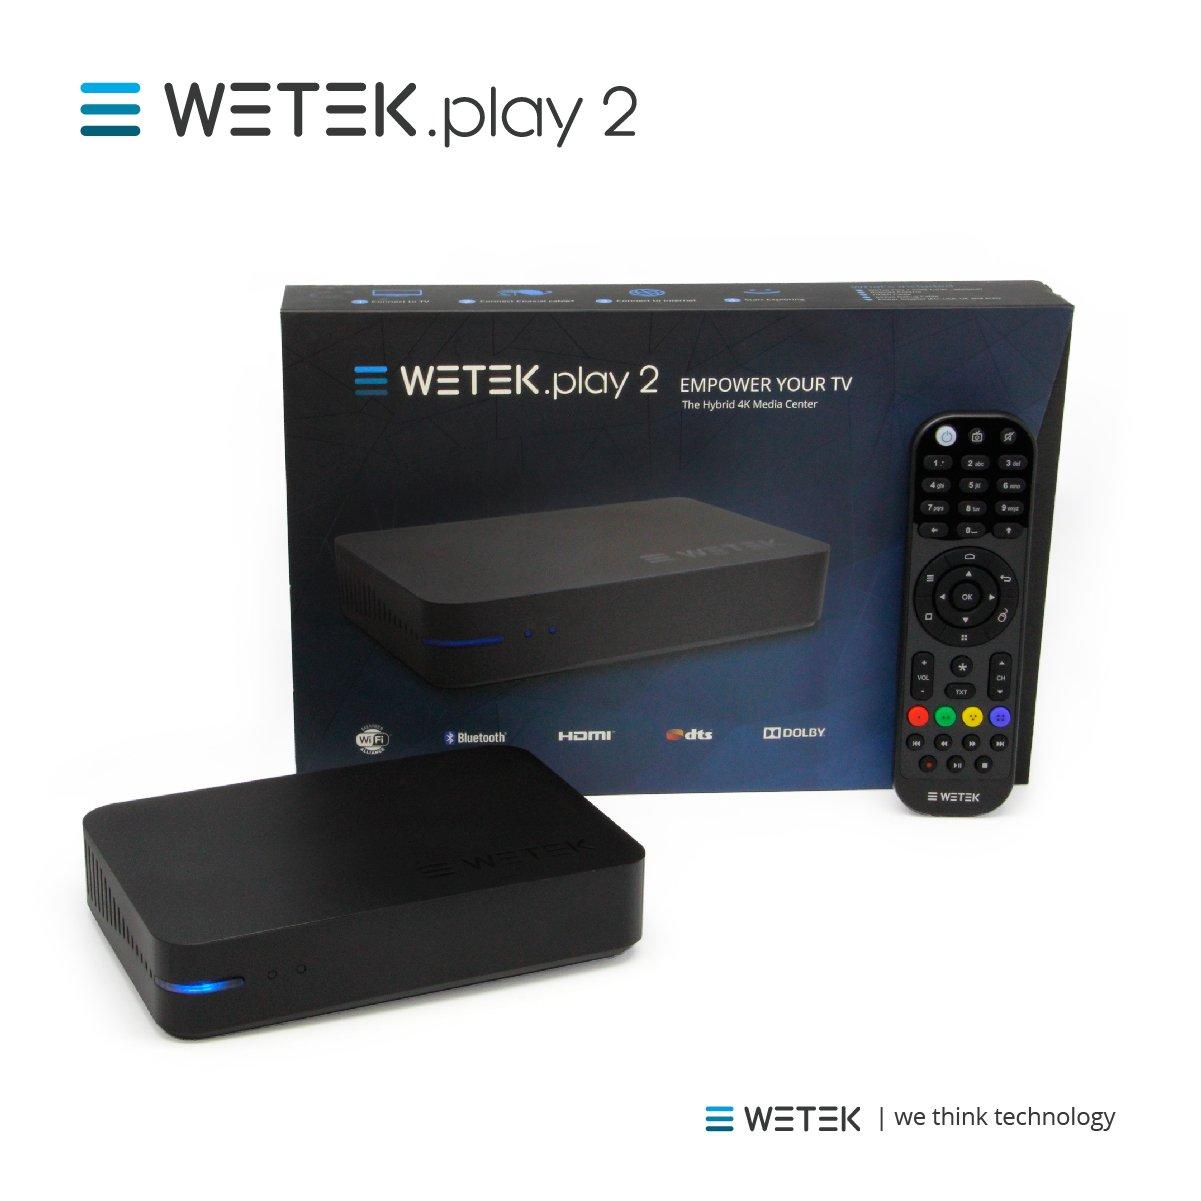 wetek core%2C hub%2C play2s  WeTek Play 2 Hybrid Media Center 4K Ultra HD Android Tv: Amazon.co ...